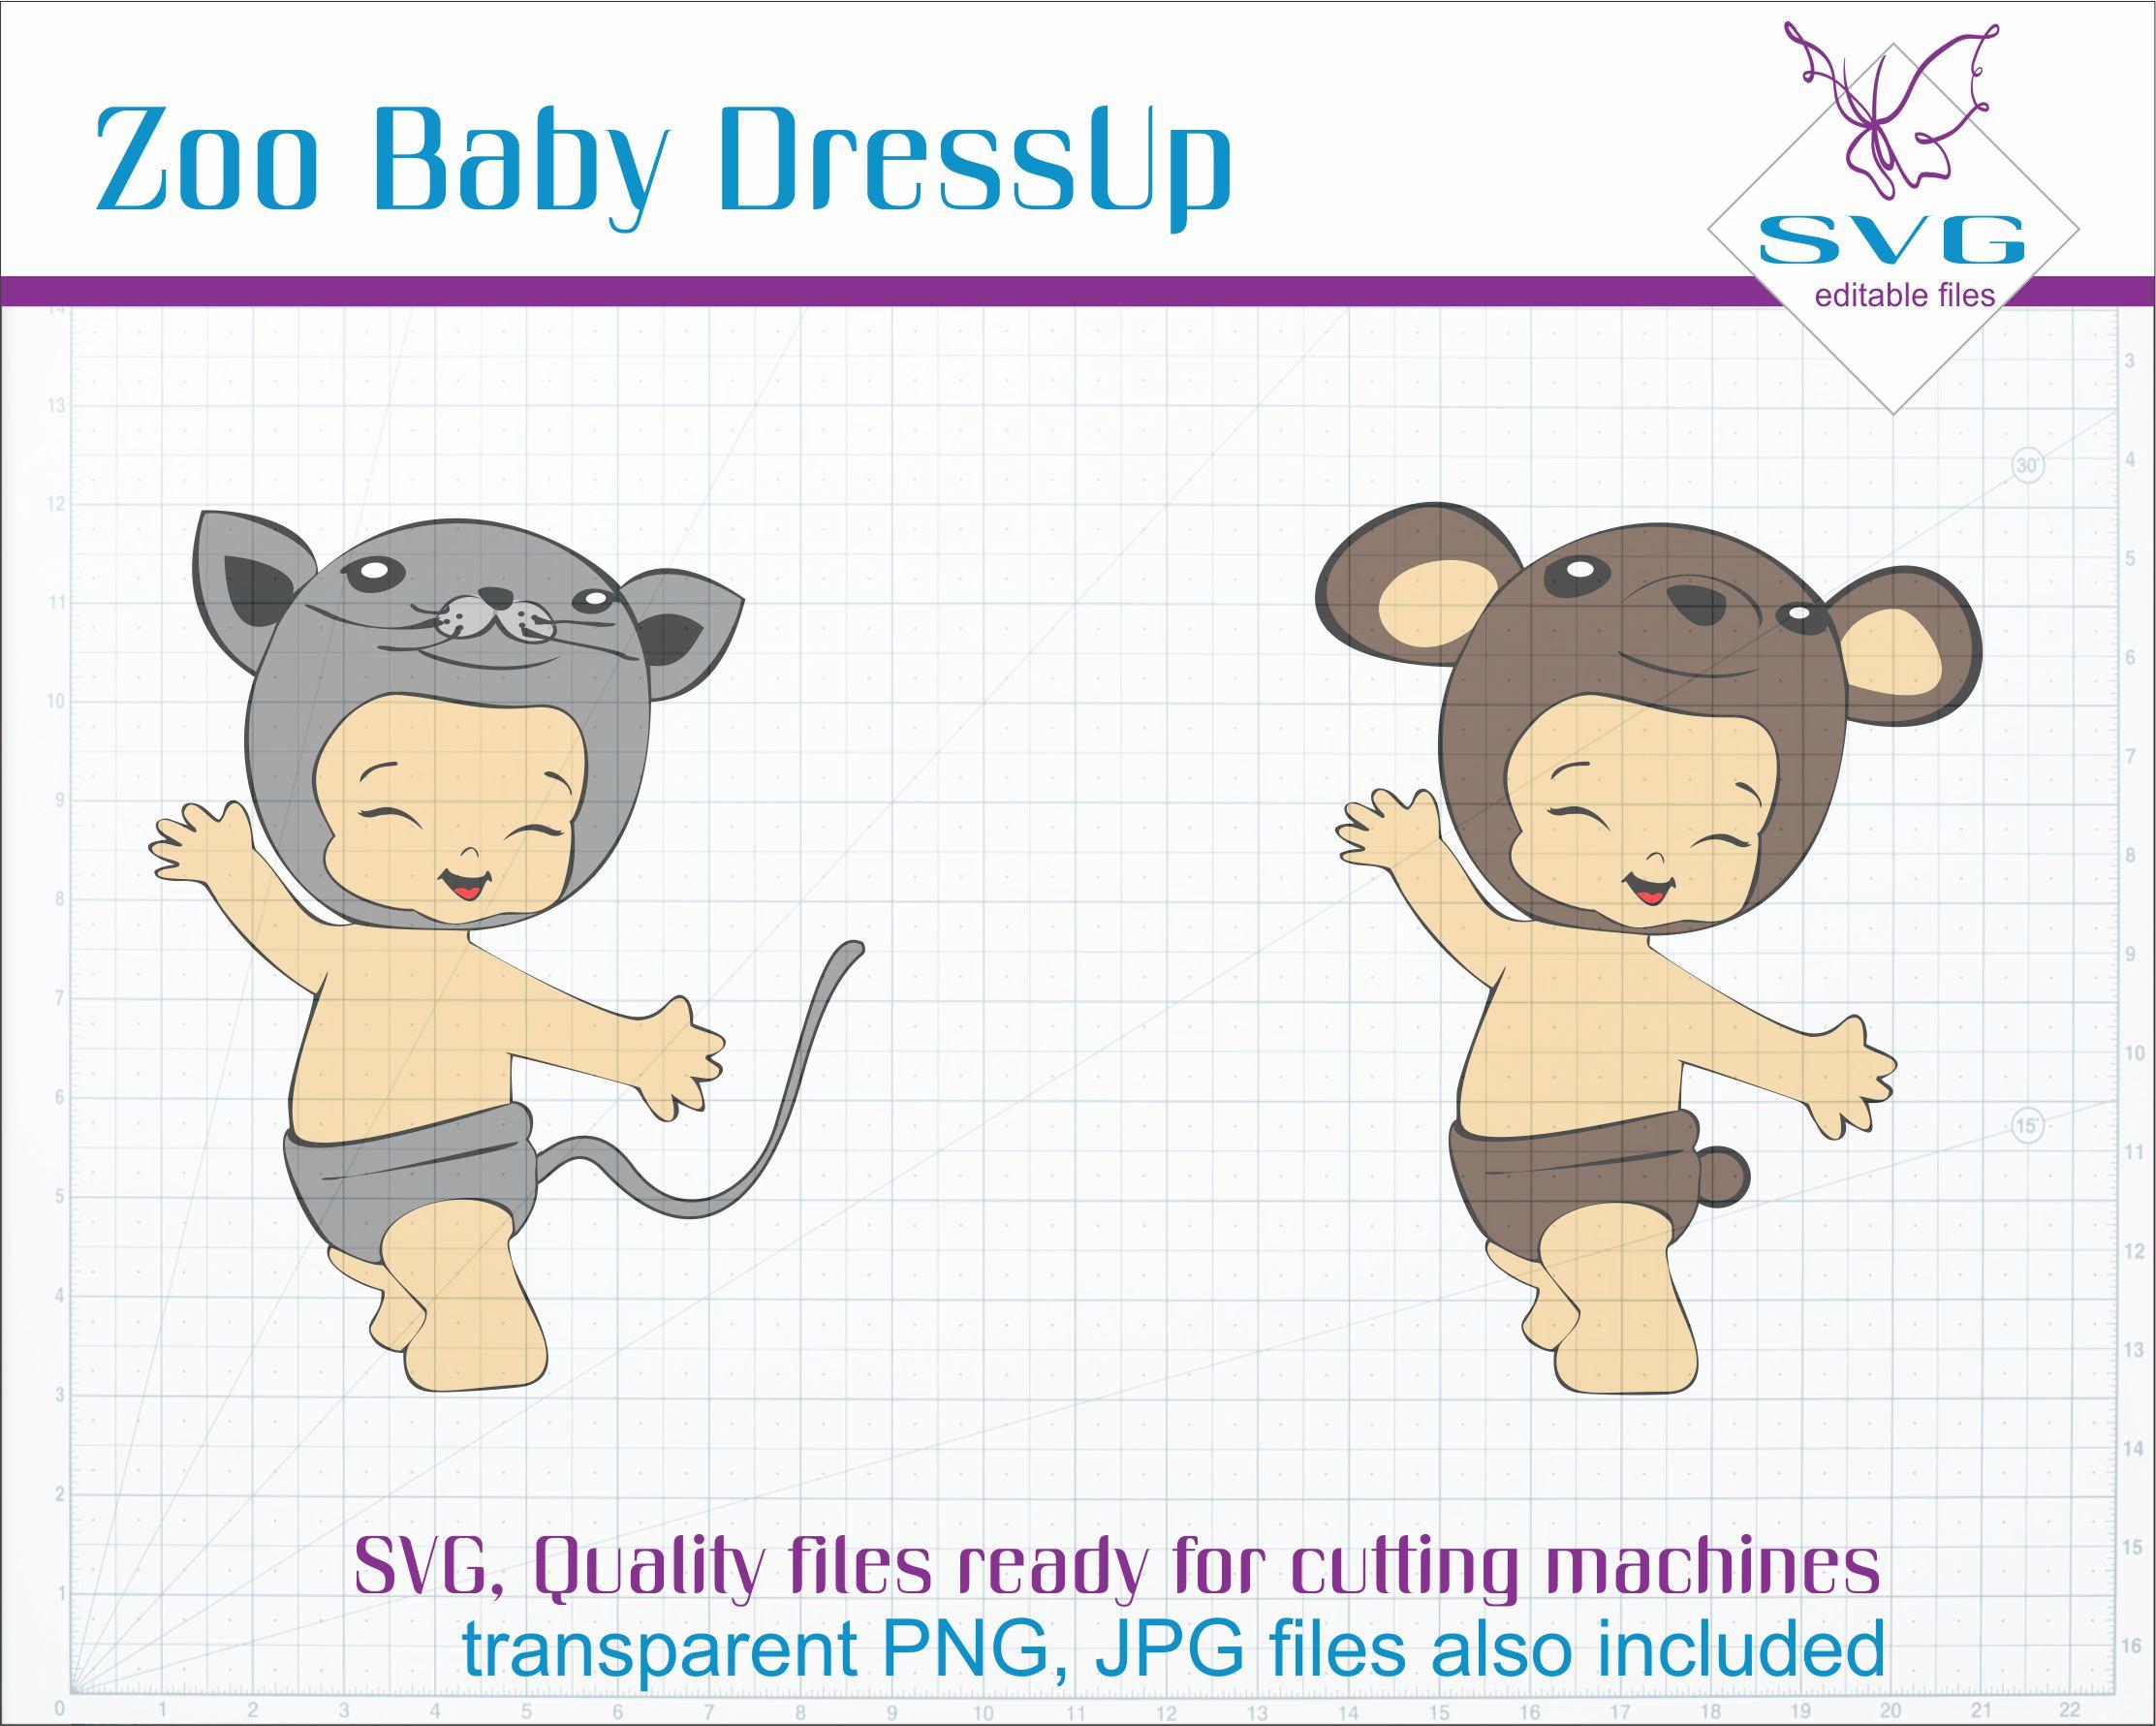 Zoo Baby Dressup example image 3